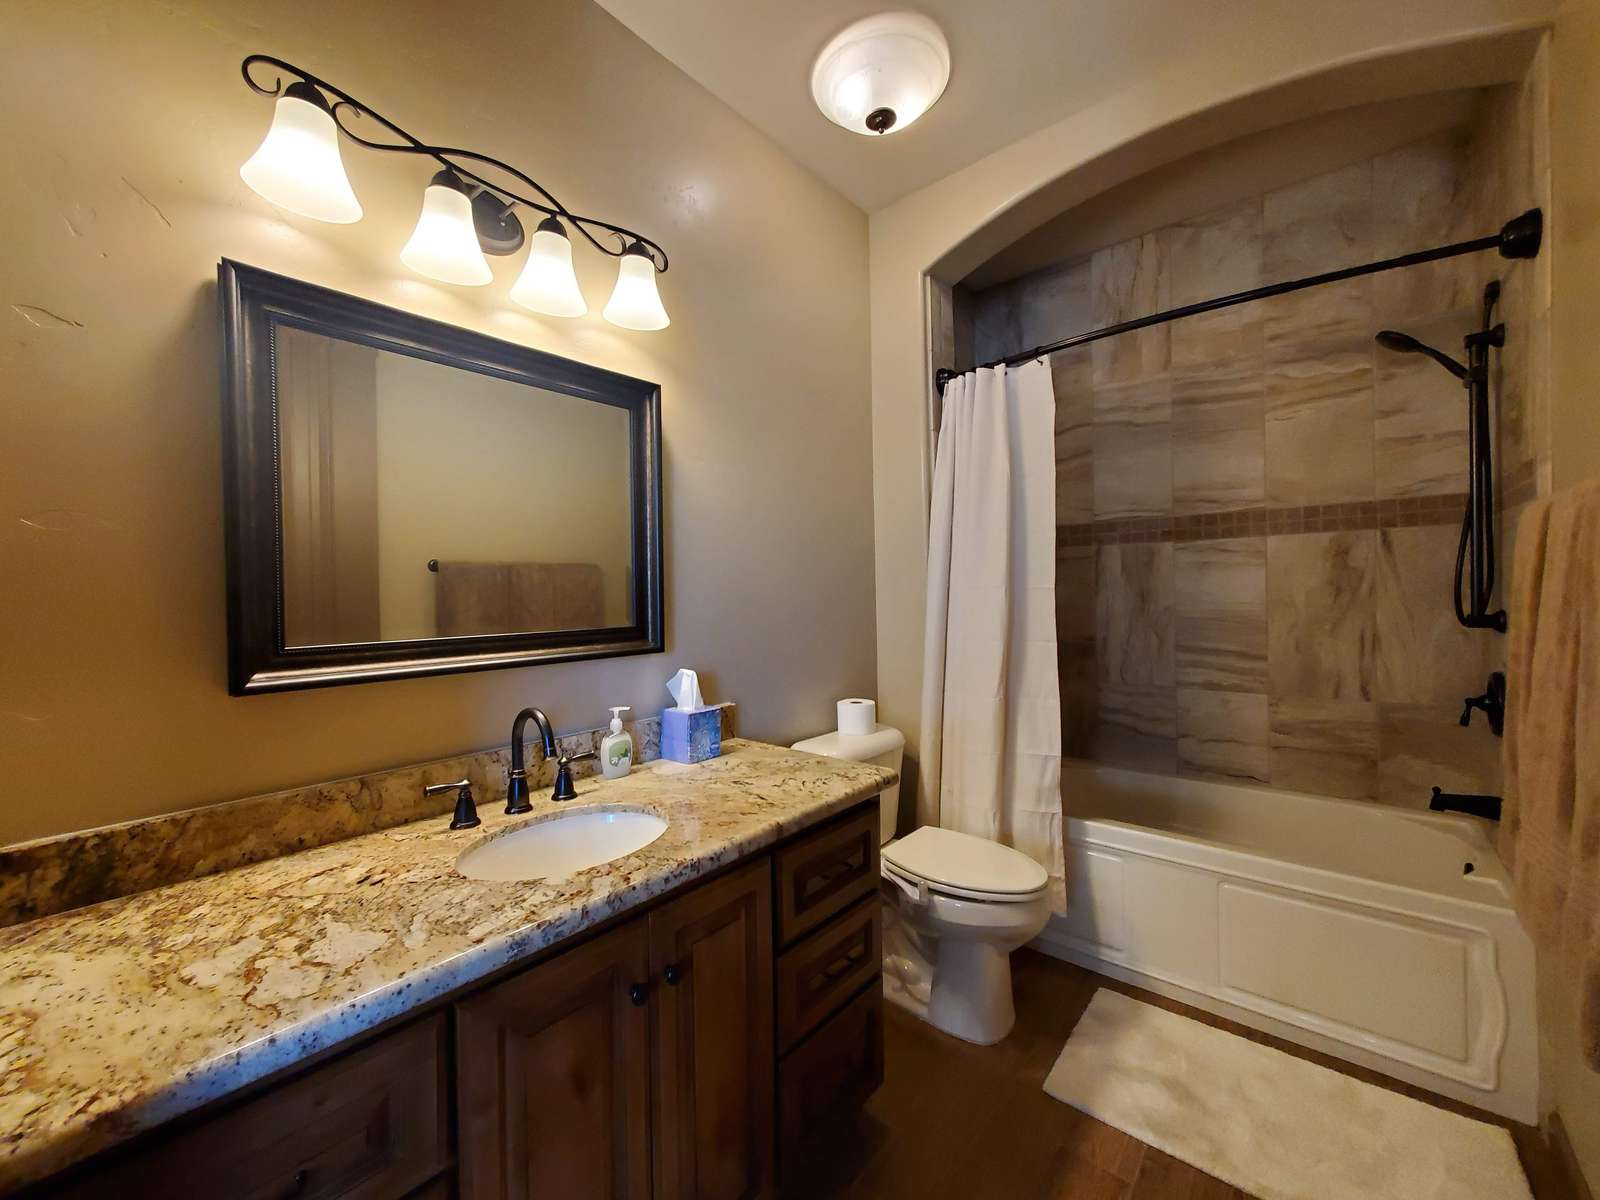 Guest Bedroom EnSuite Bath